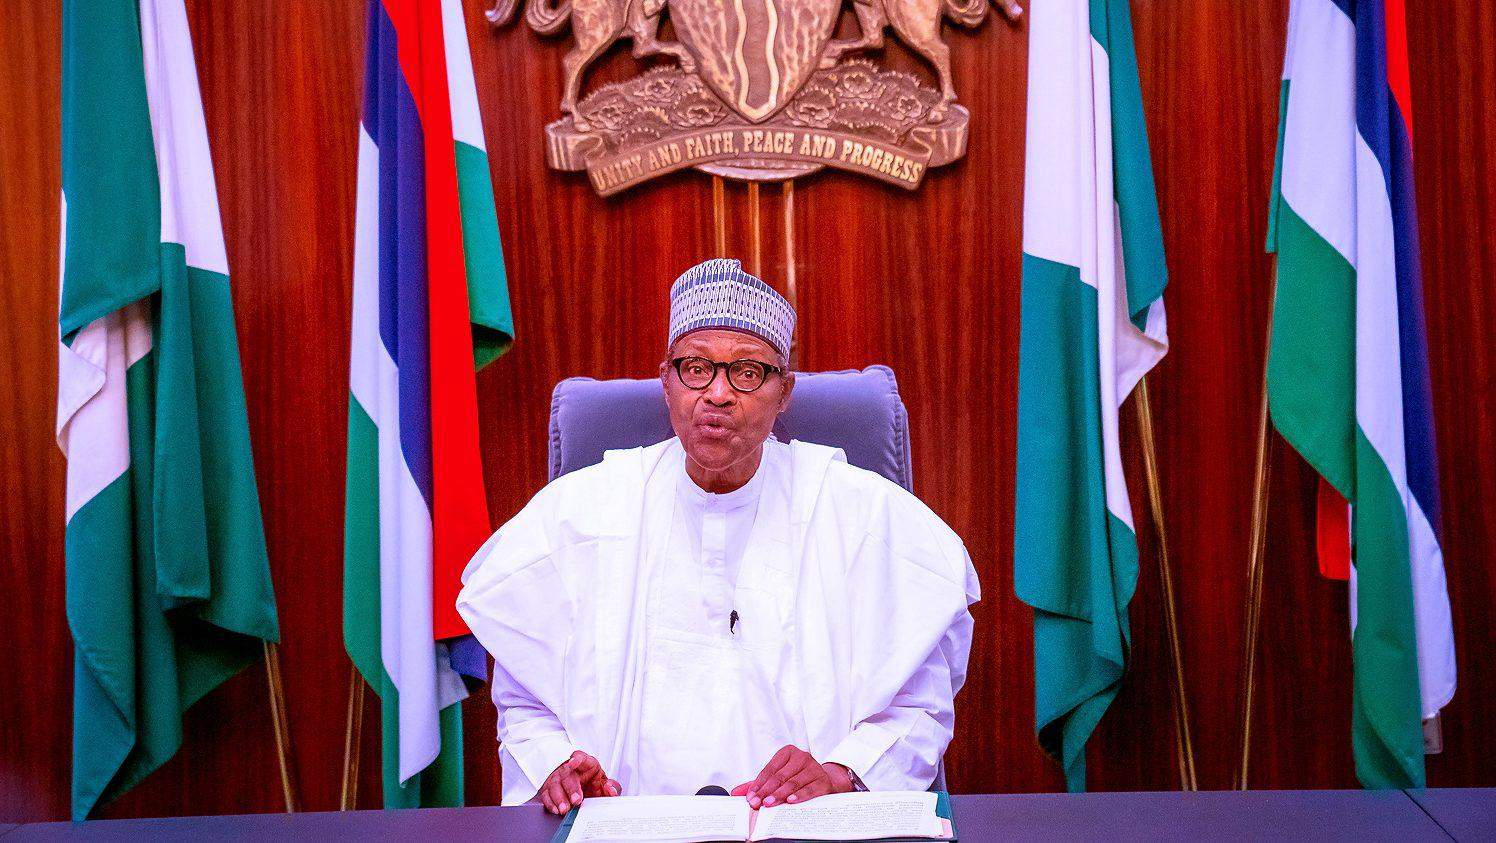 President Muhammadu Buhari delivers a televised address after the #EndSARS Protests.  Image Source: Nigerian Presidency via Reuters